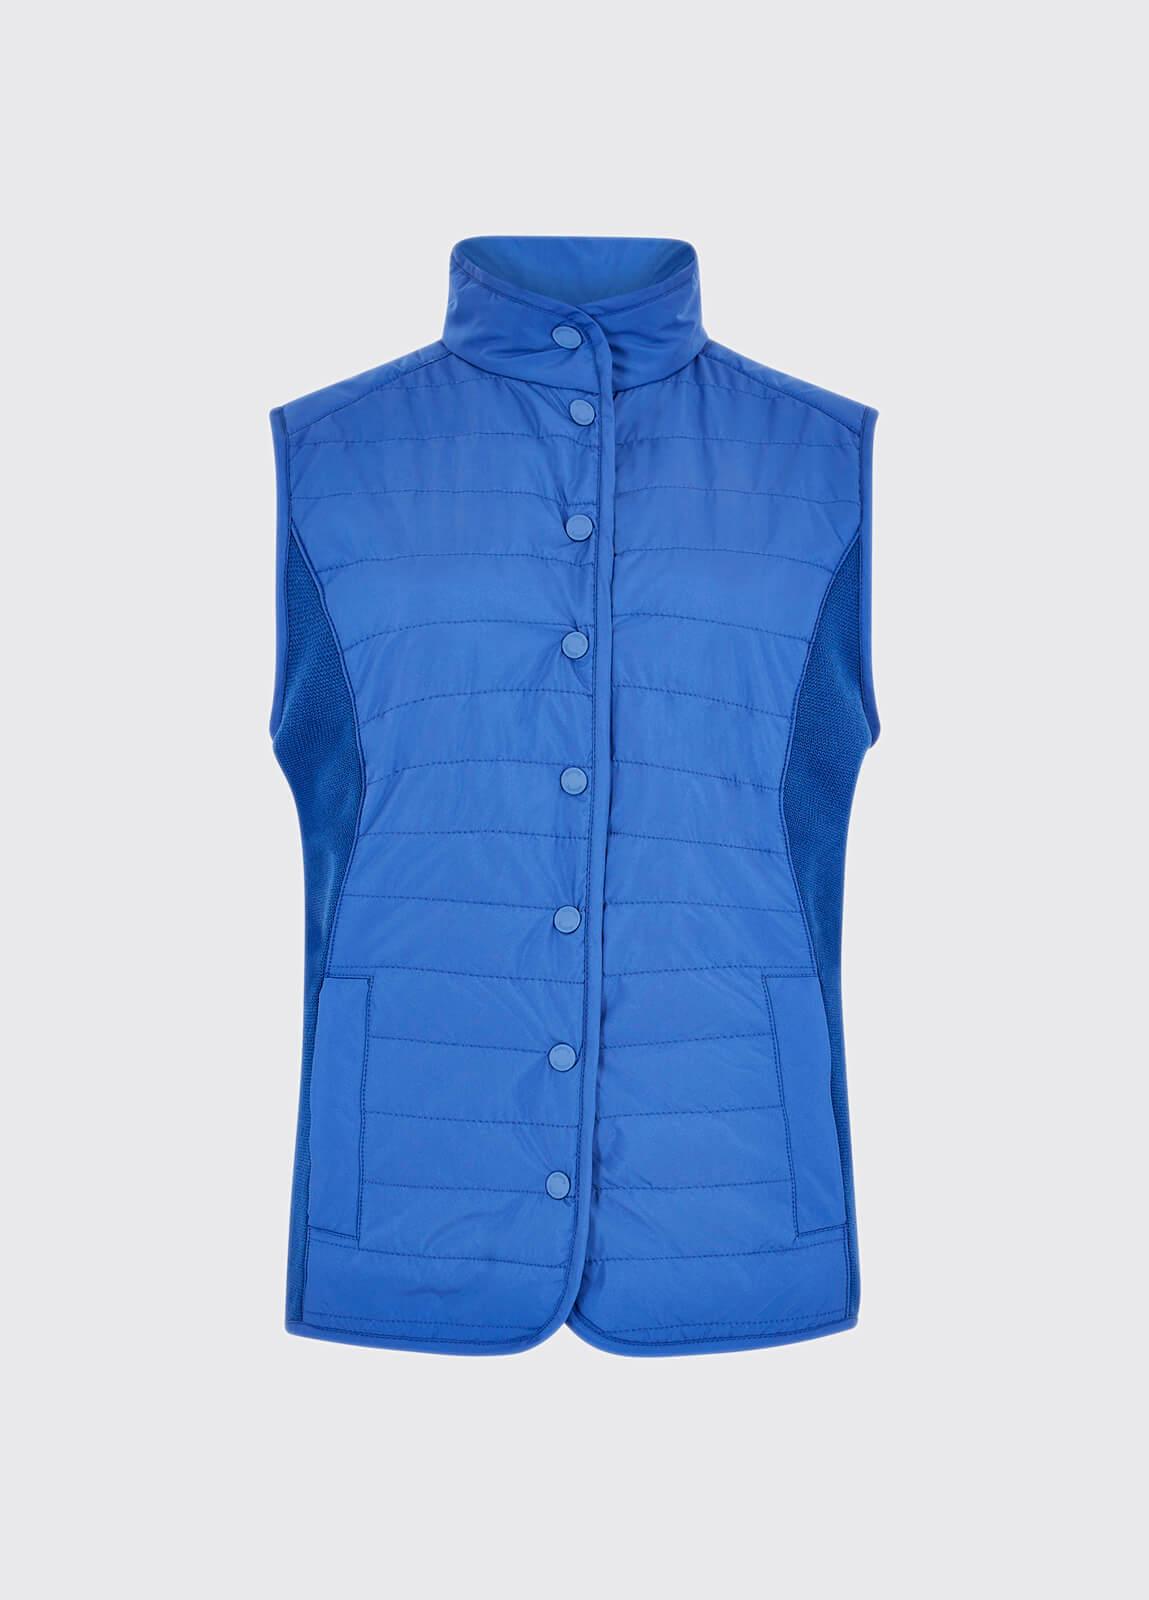 Bayview Gilet - Royal Blue